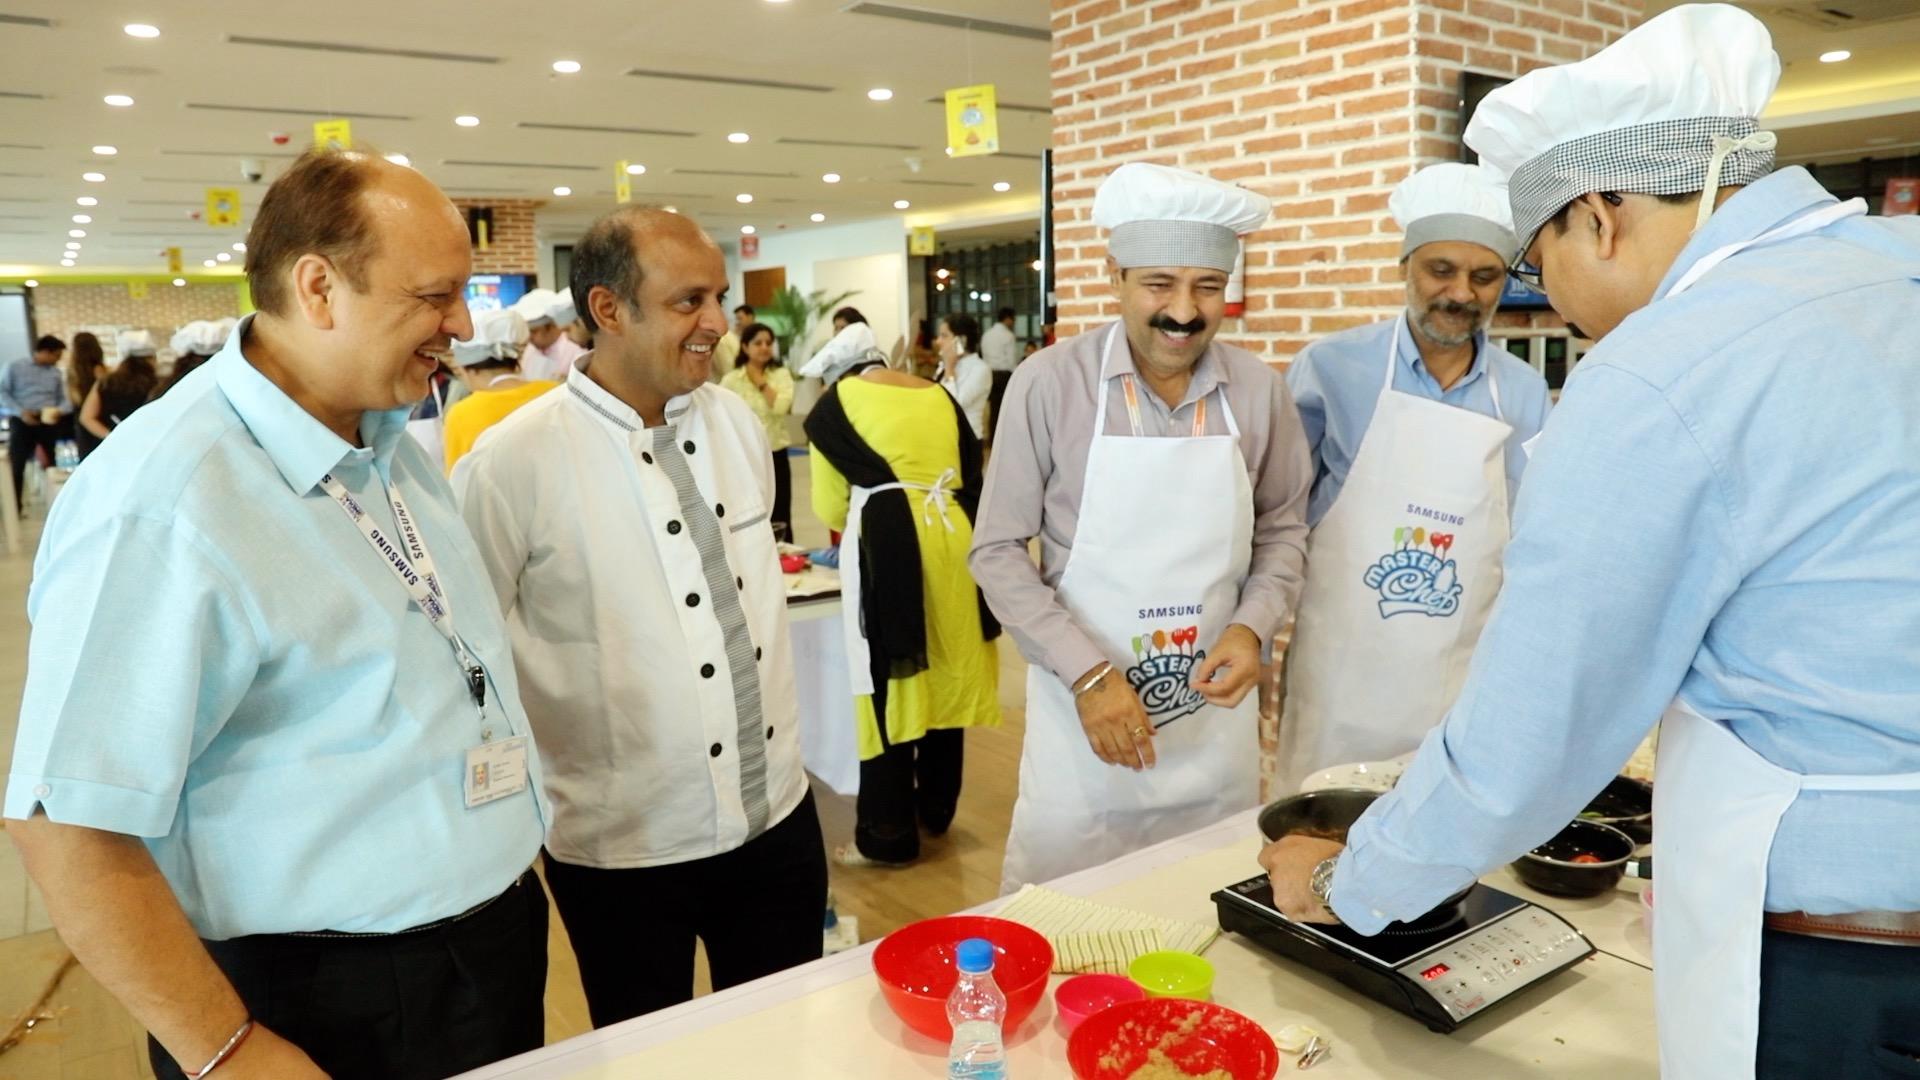 Samsung India Masterchef competition